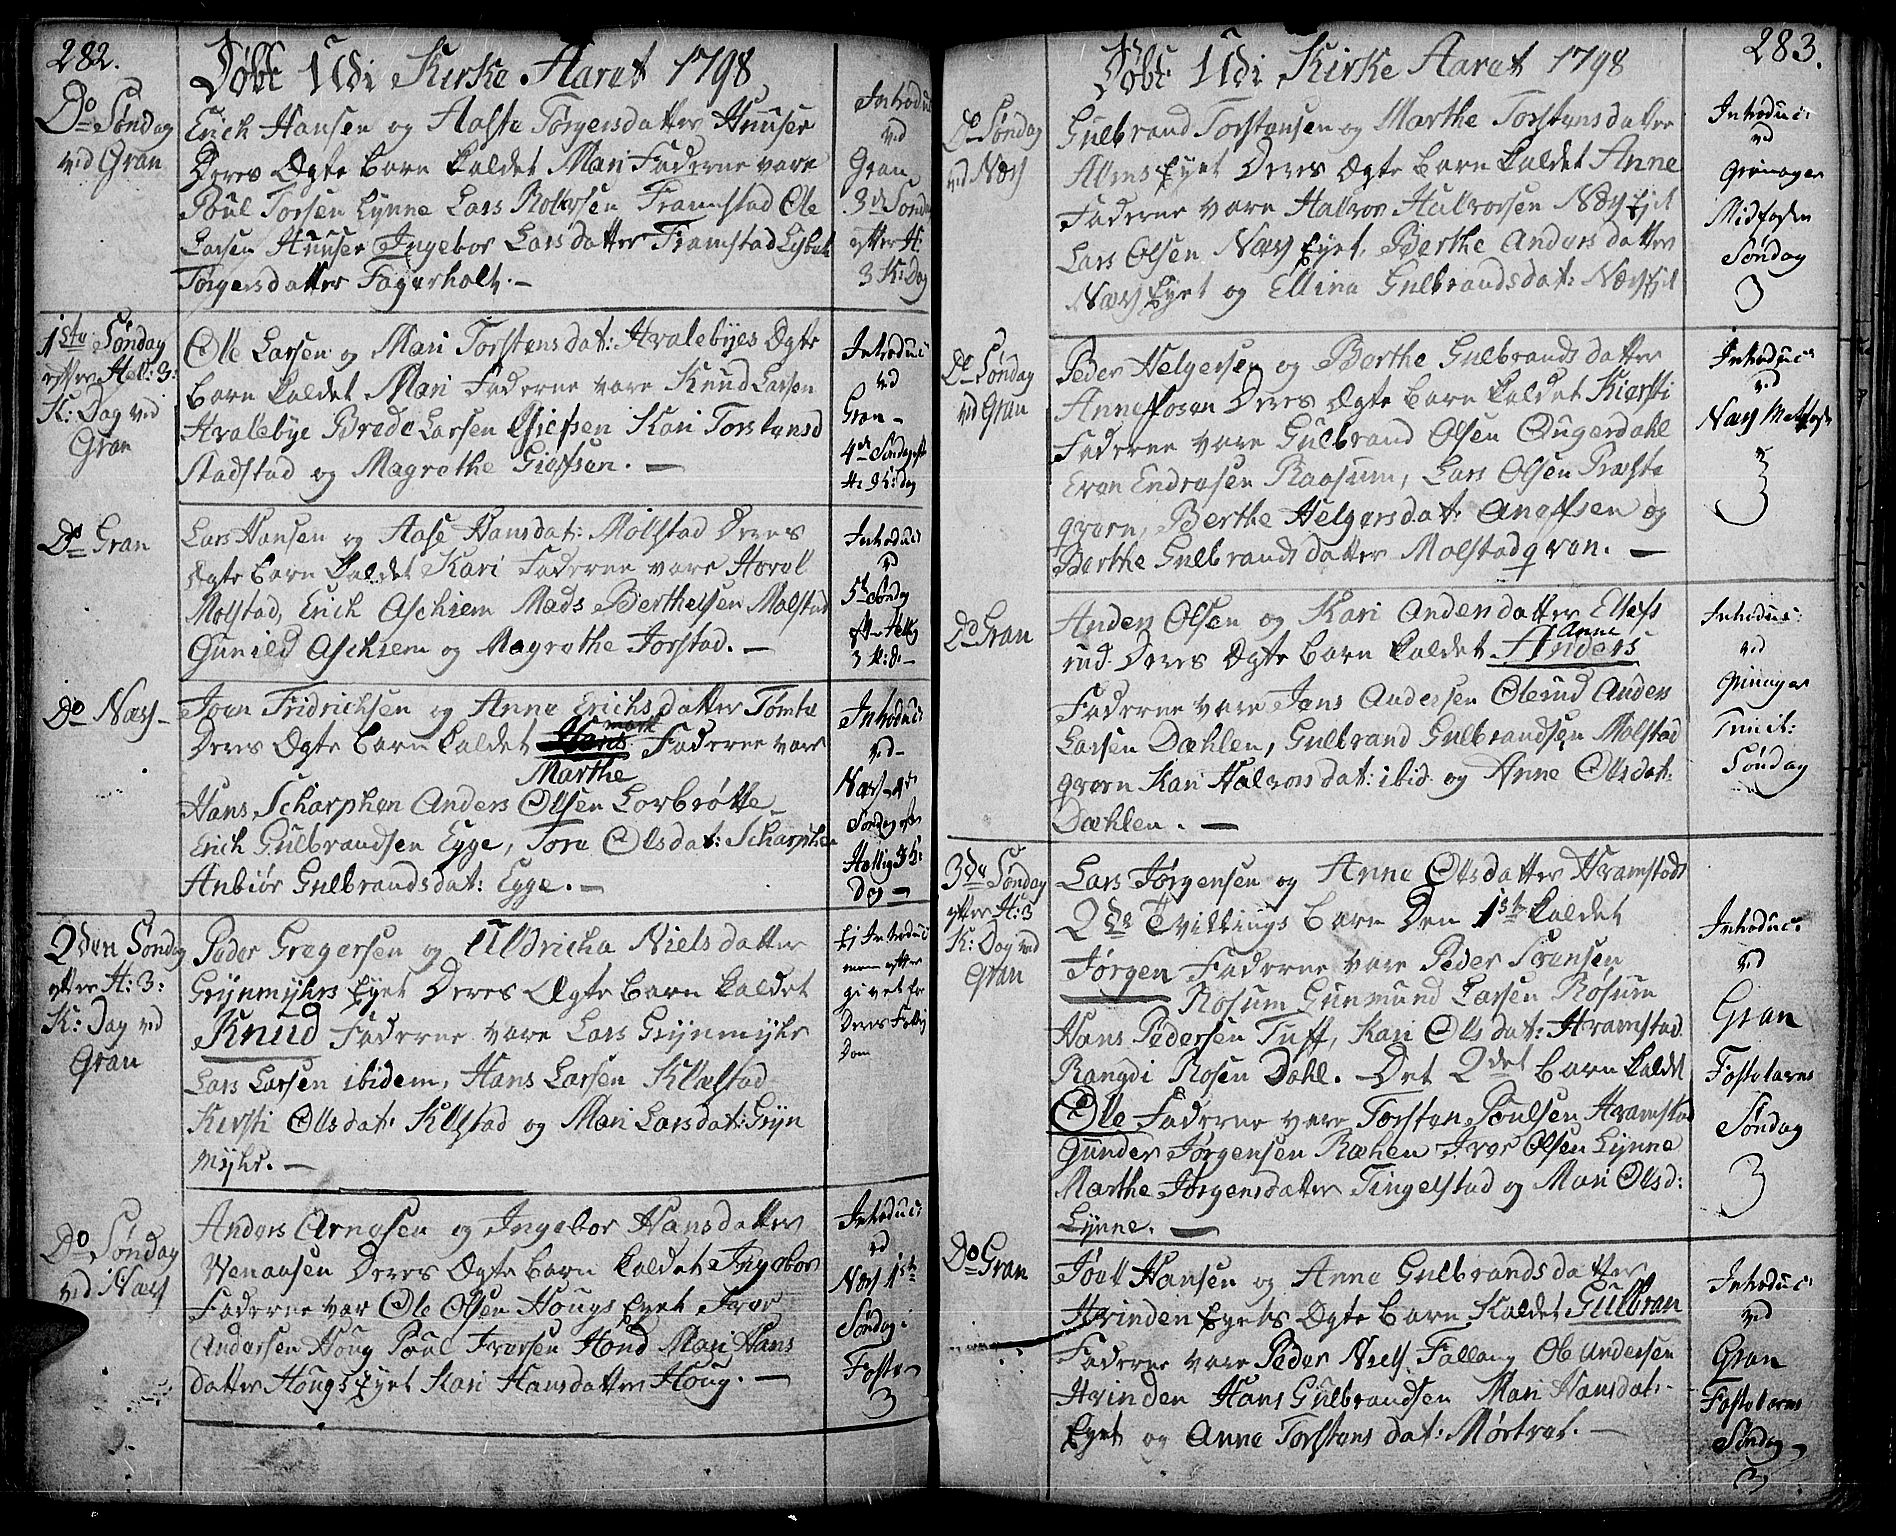 SAH, Gran prestekontor, Ministerialbok nr. 6, 1787-1824, s. 282-283